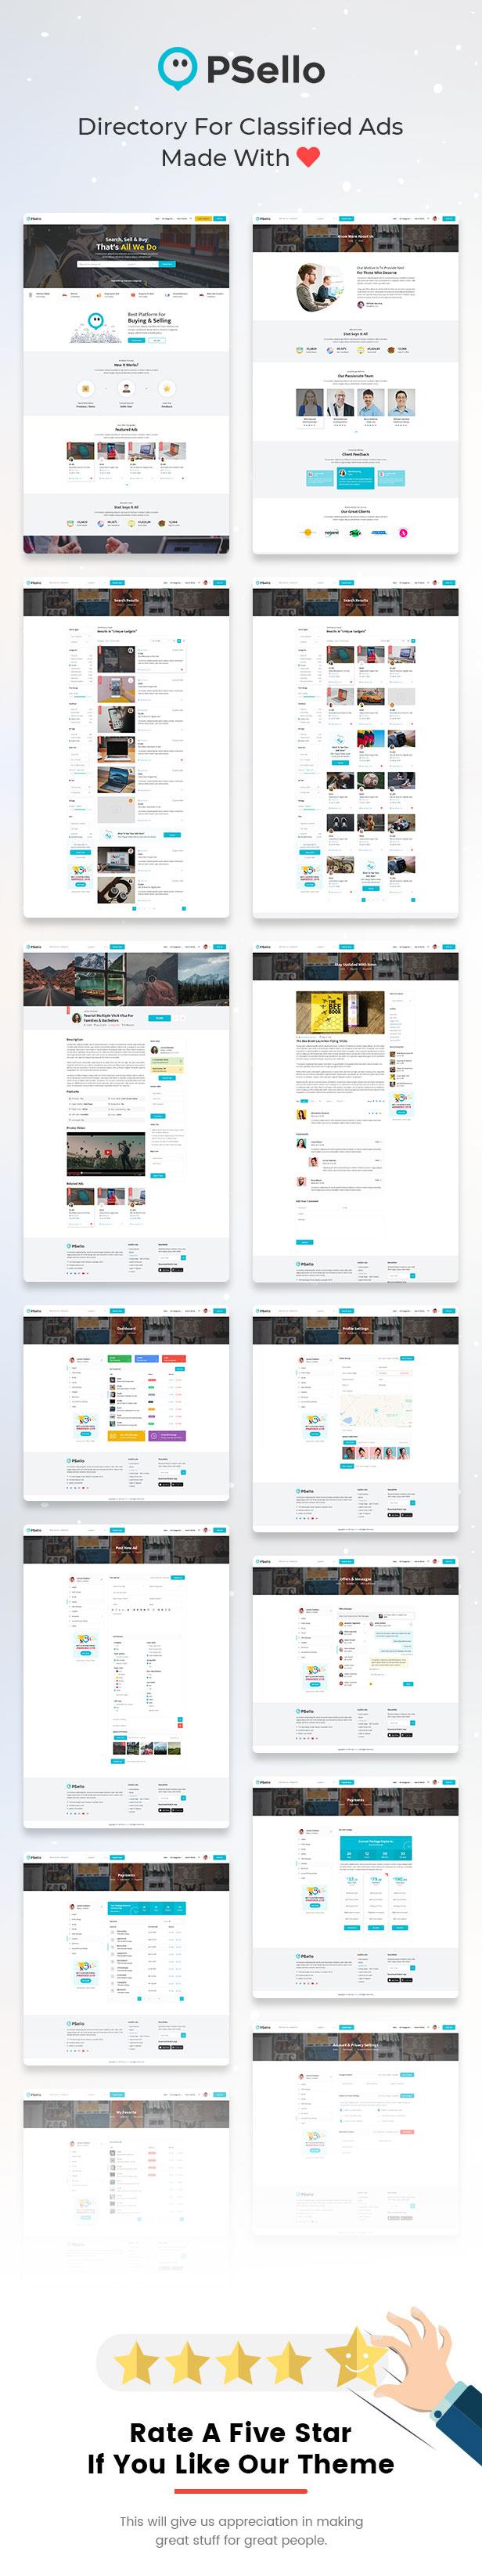 Psello - Classifid Ads Marketplace PSD Template - 4